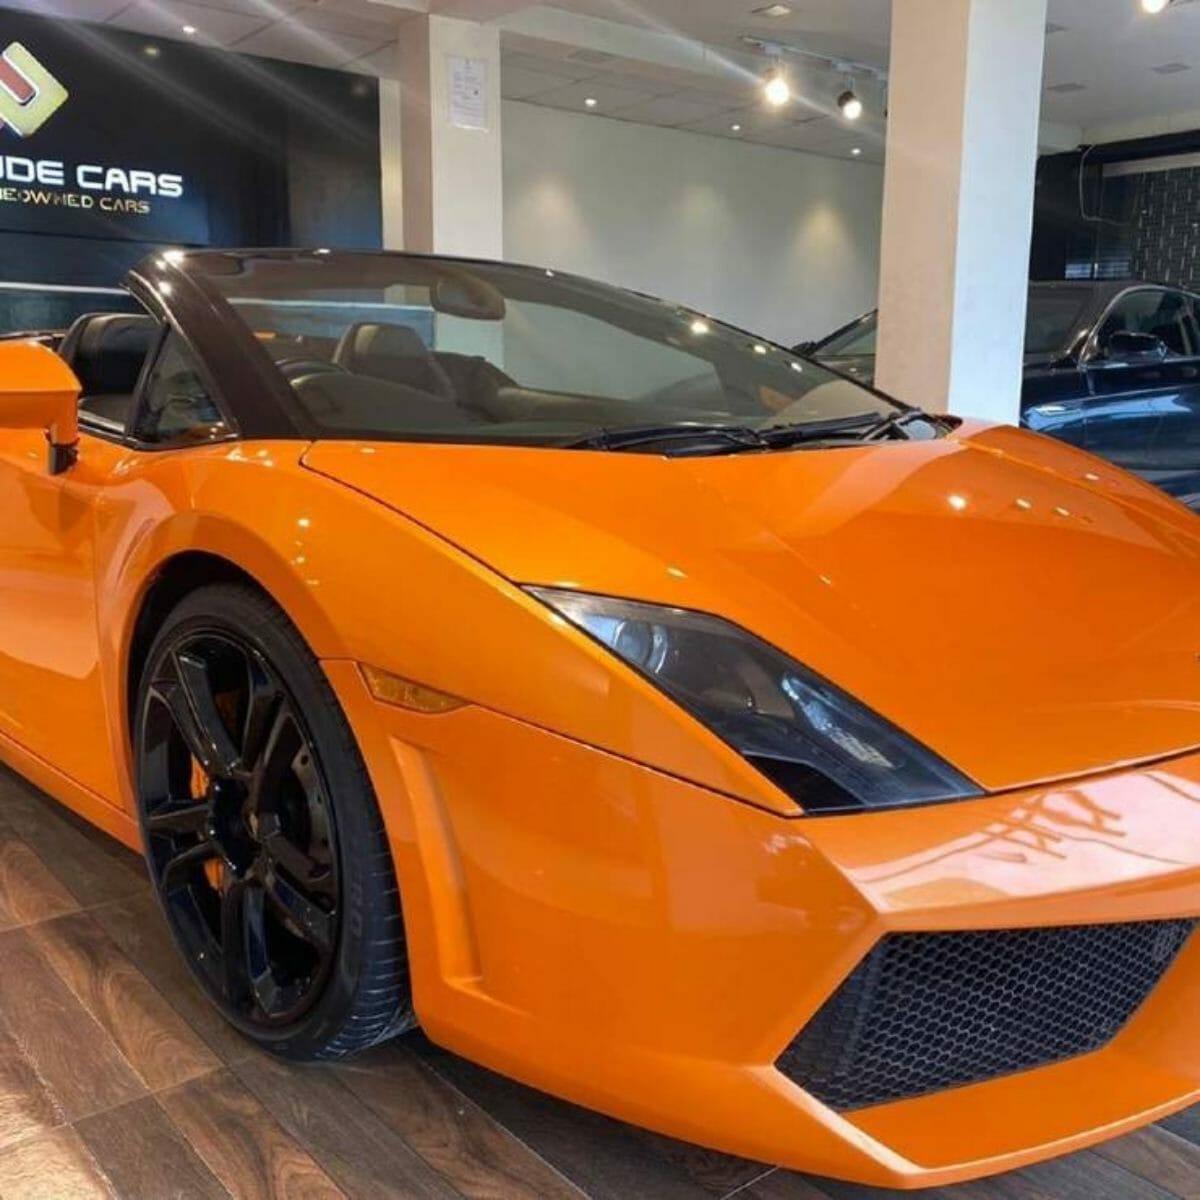 Lamborghini Gallardo_virat kohli